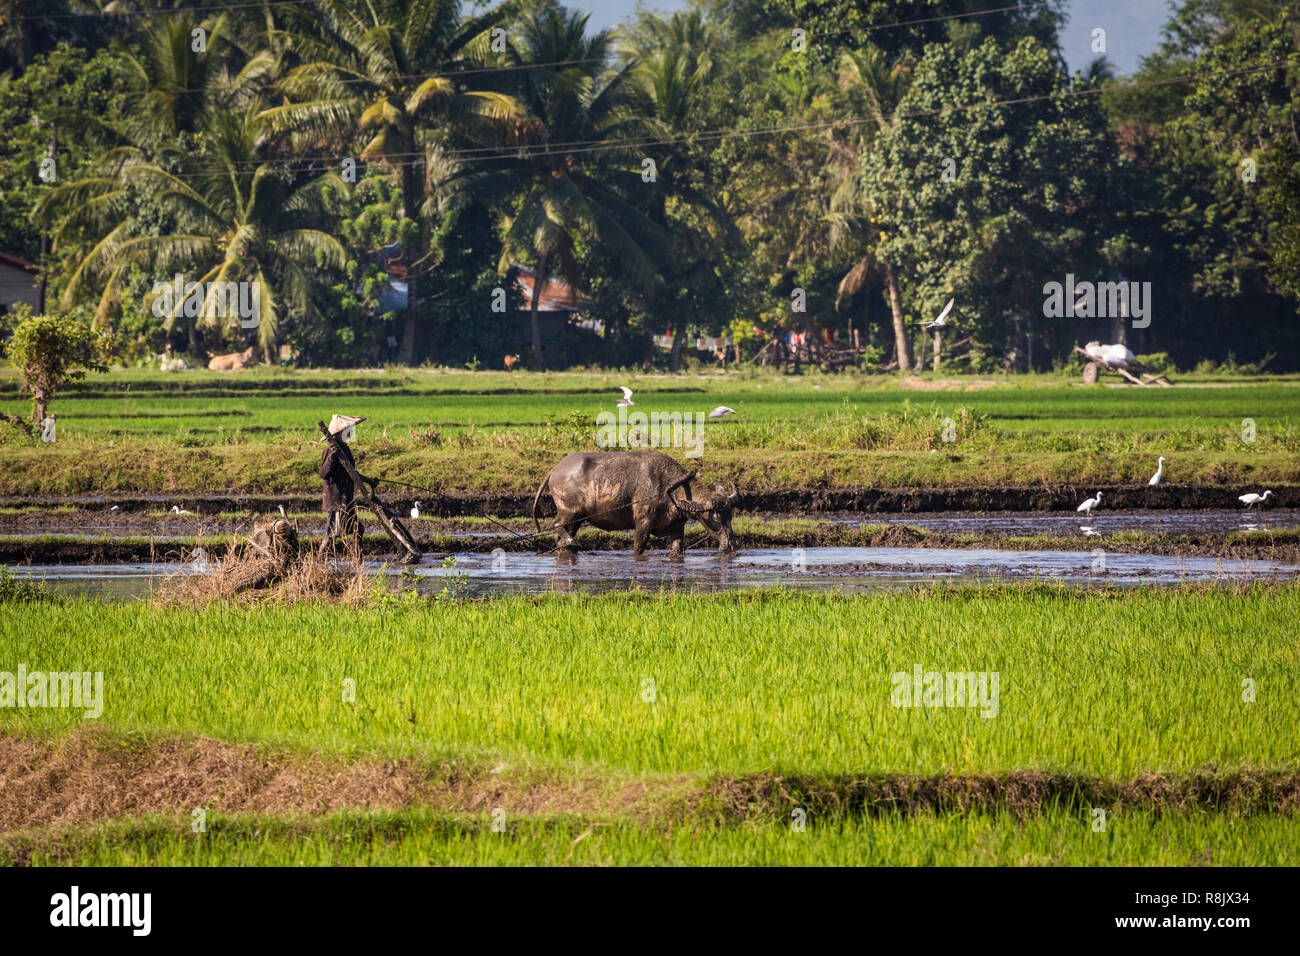 Arbeit auf einem Reisfeld auf Mindanao, Philippinen - Stock Image